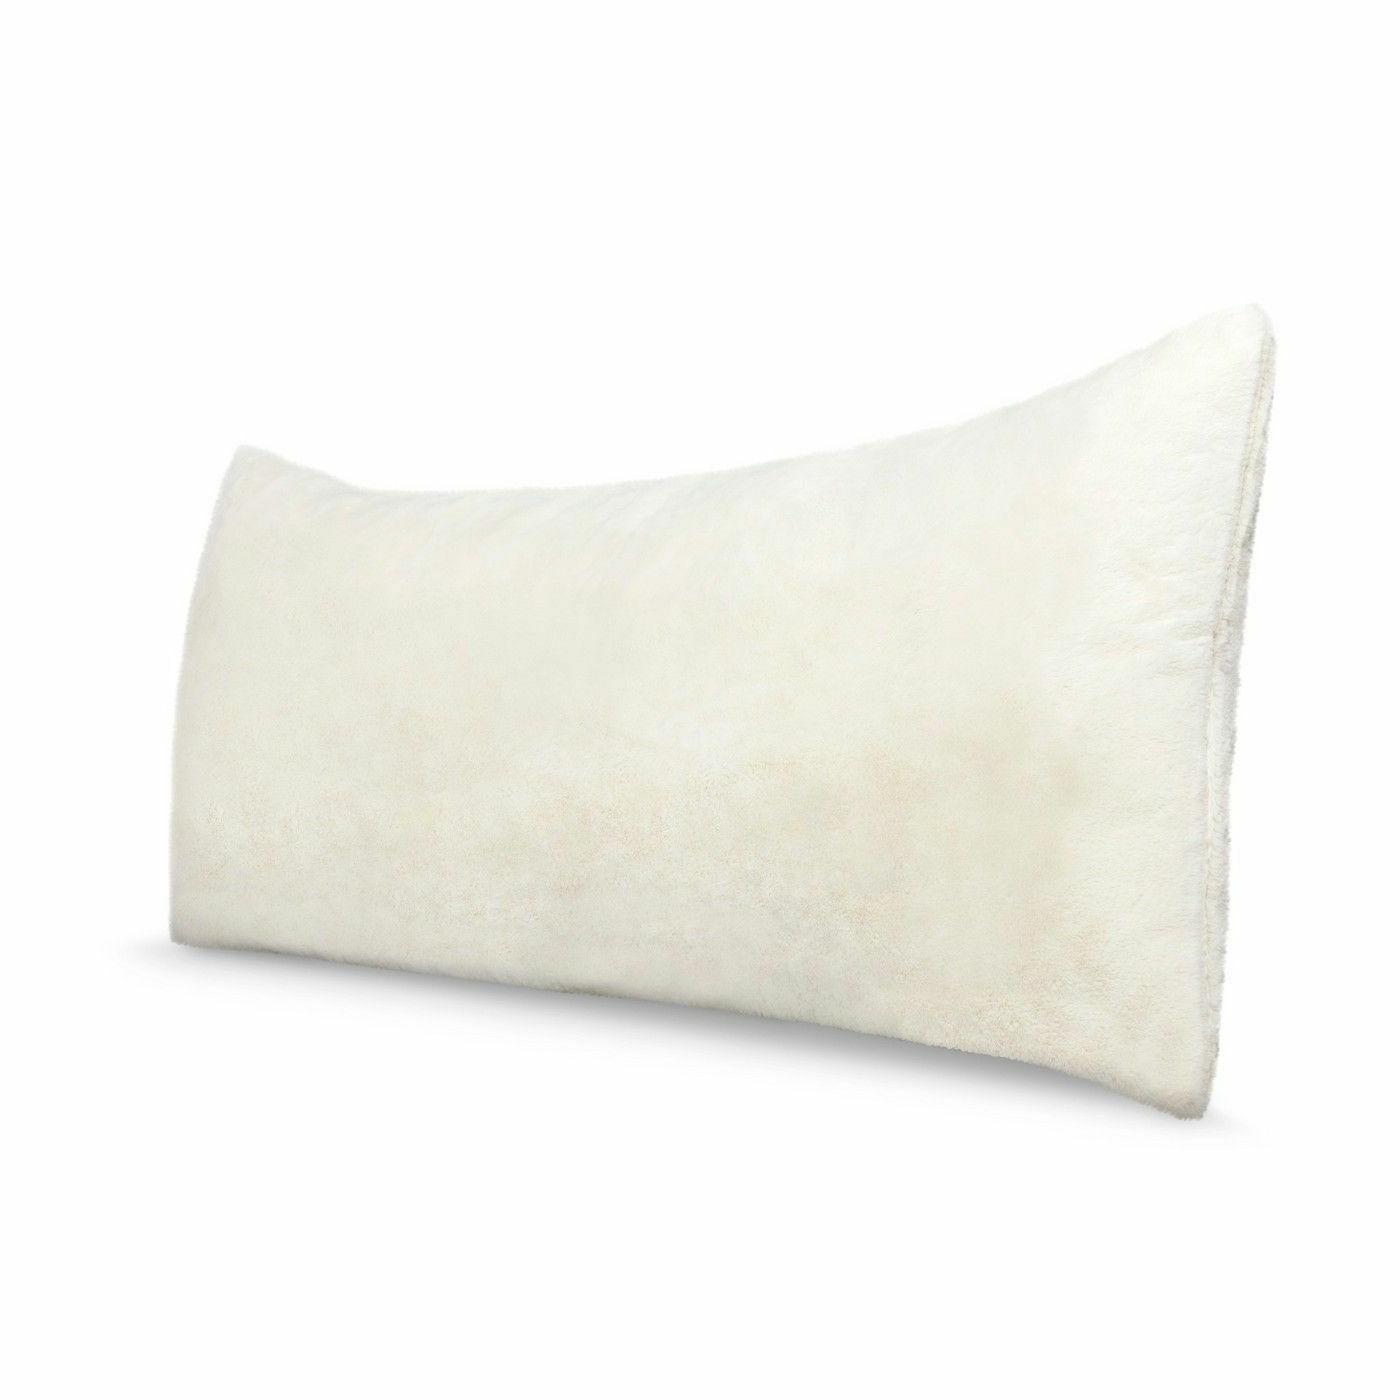 Room Essentials White Faux Case - Soft